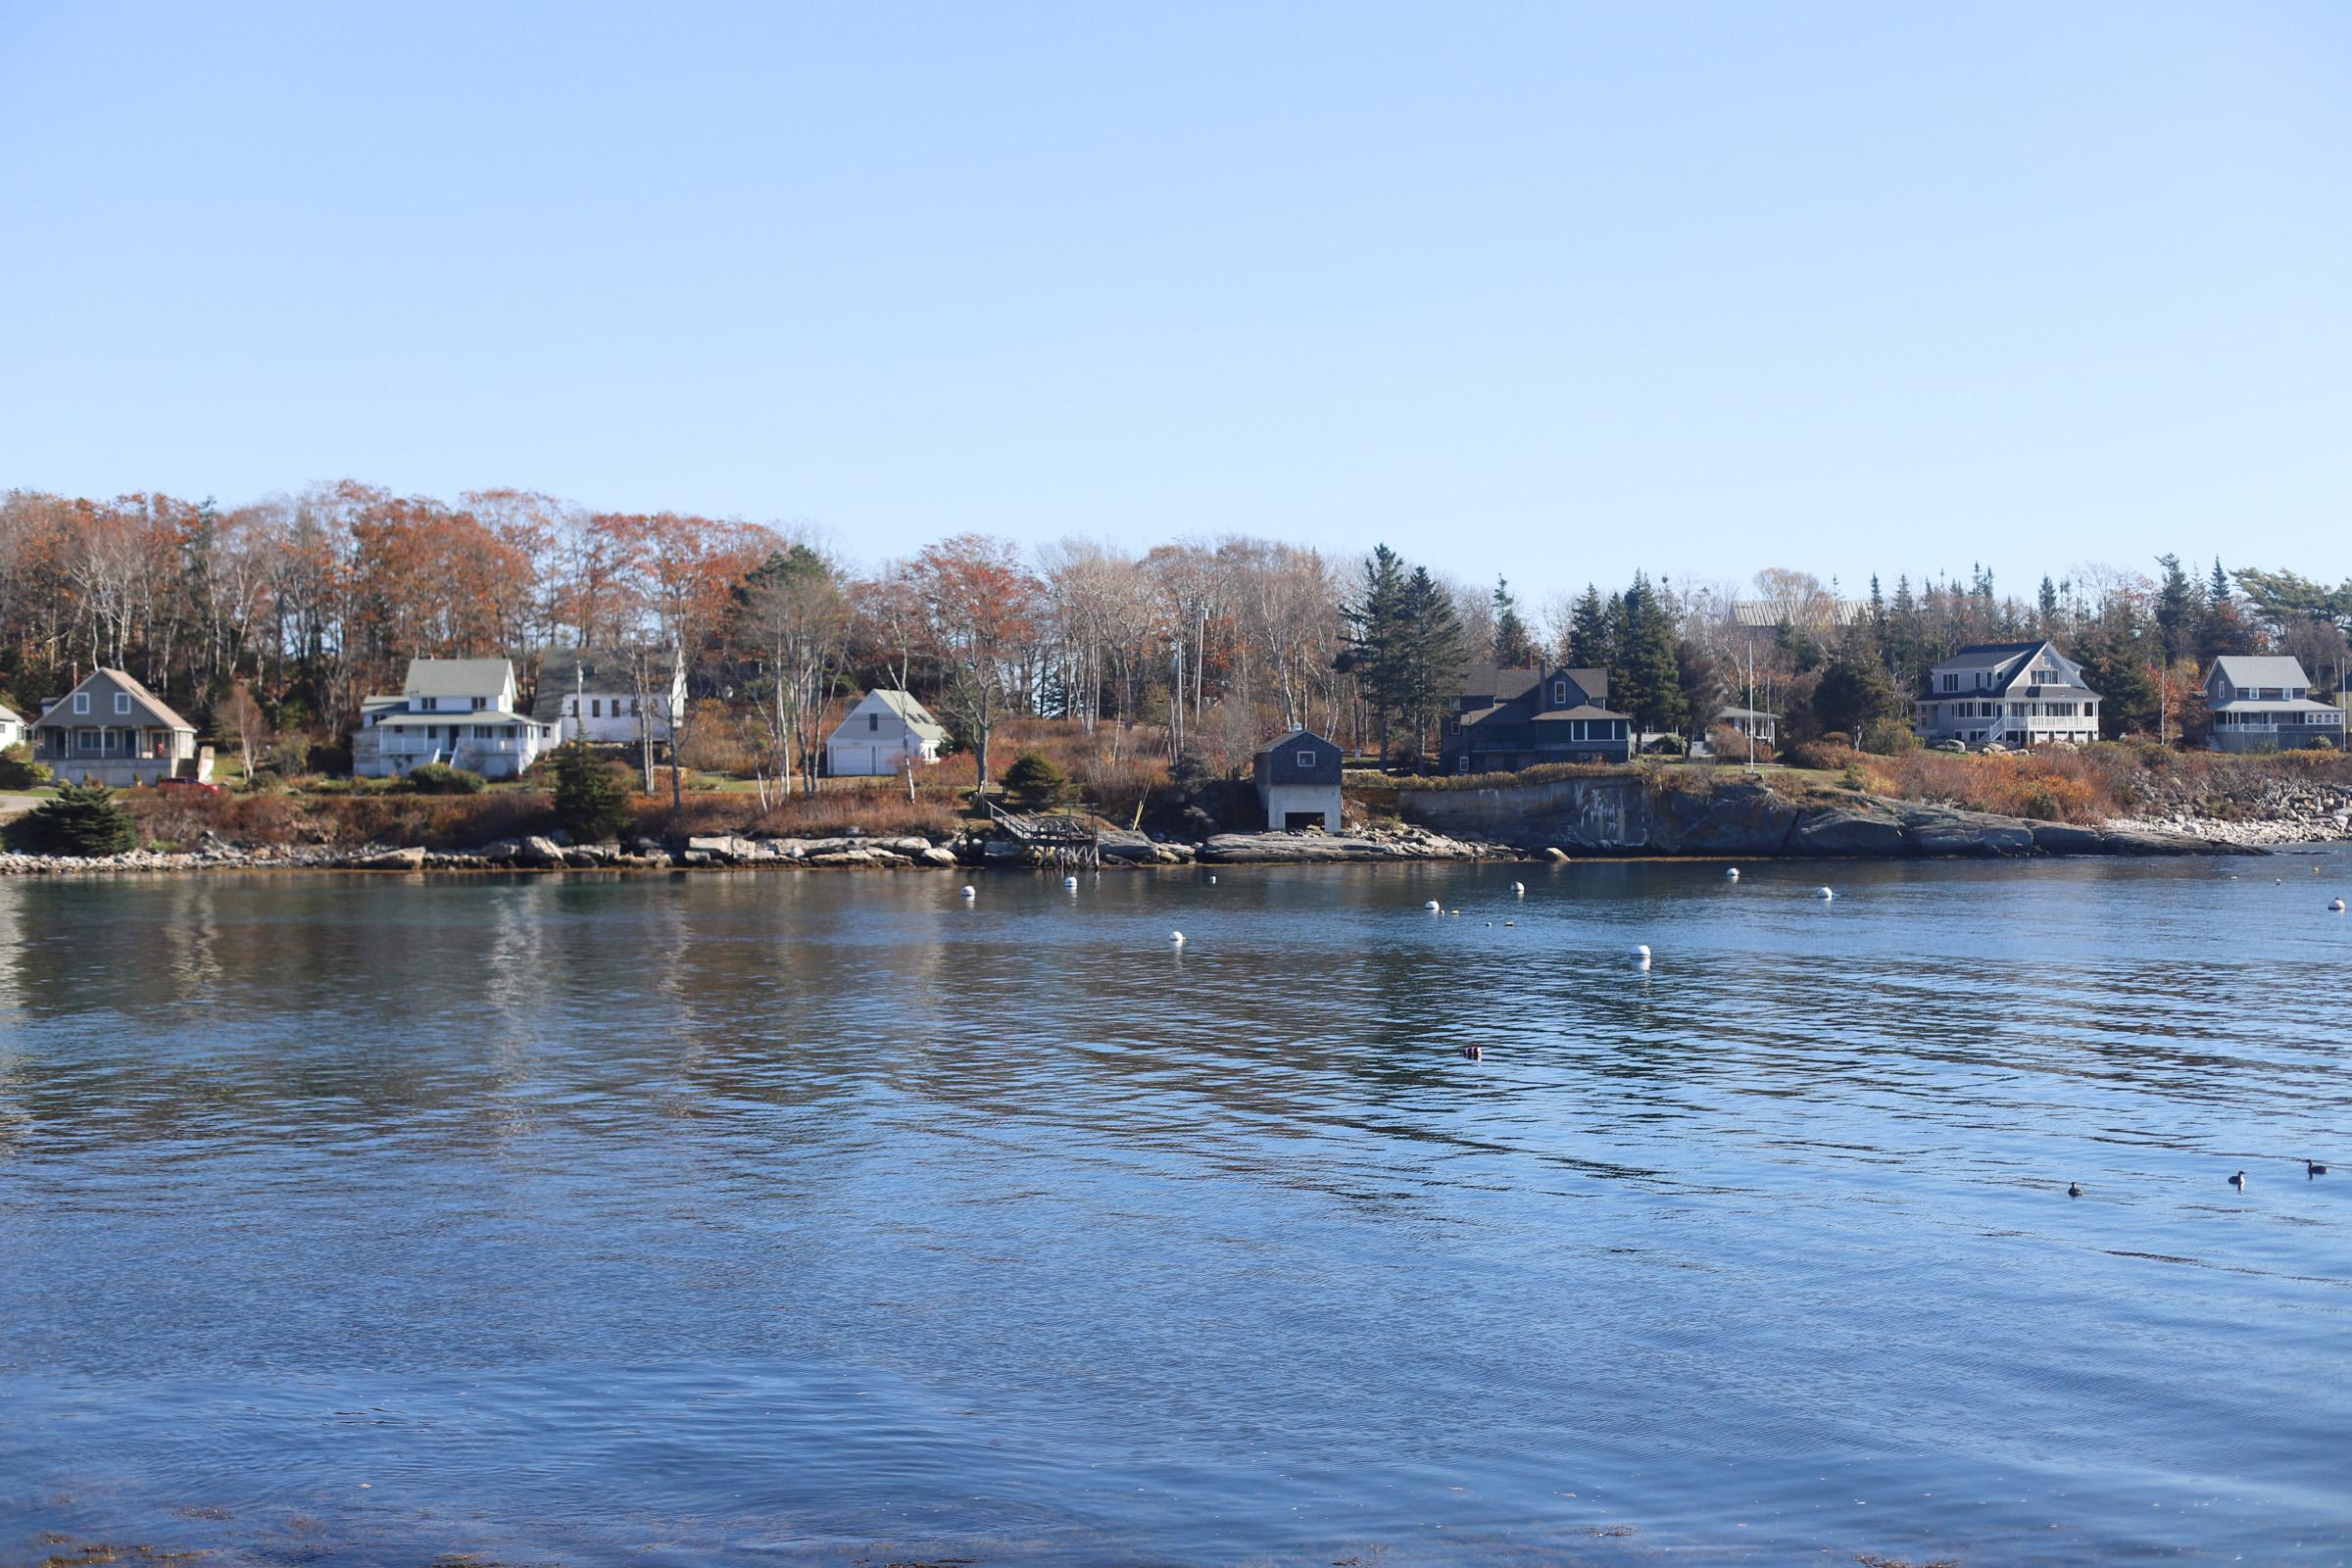 A Weekend Away: Celebrating Our 10th Wedding Anniversary in Maine | @glitterinclexi | GLITTERINC.COM